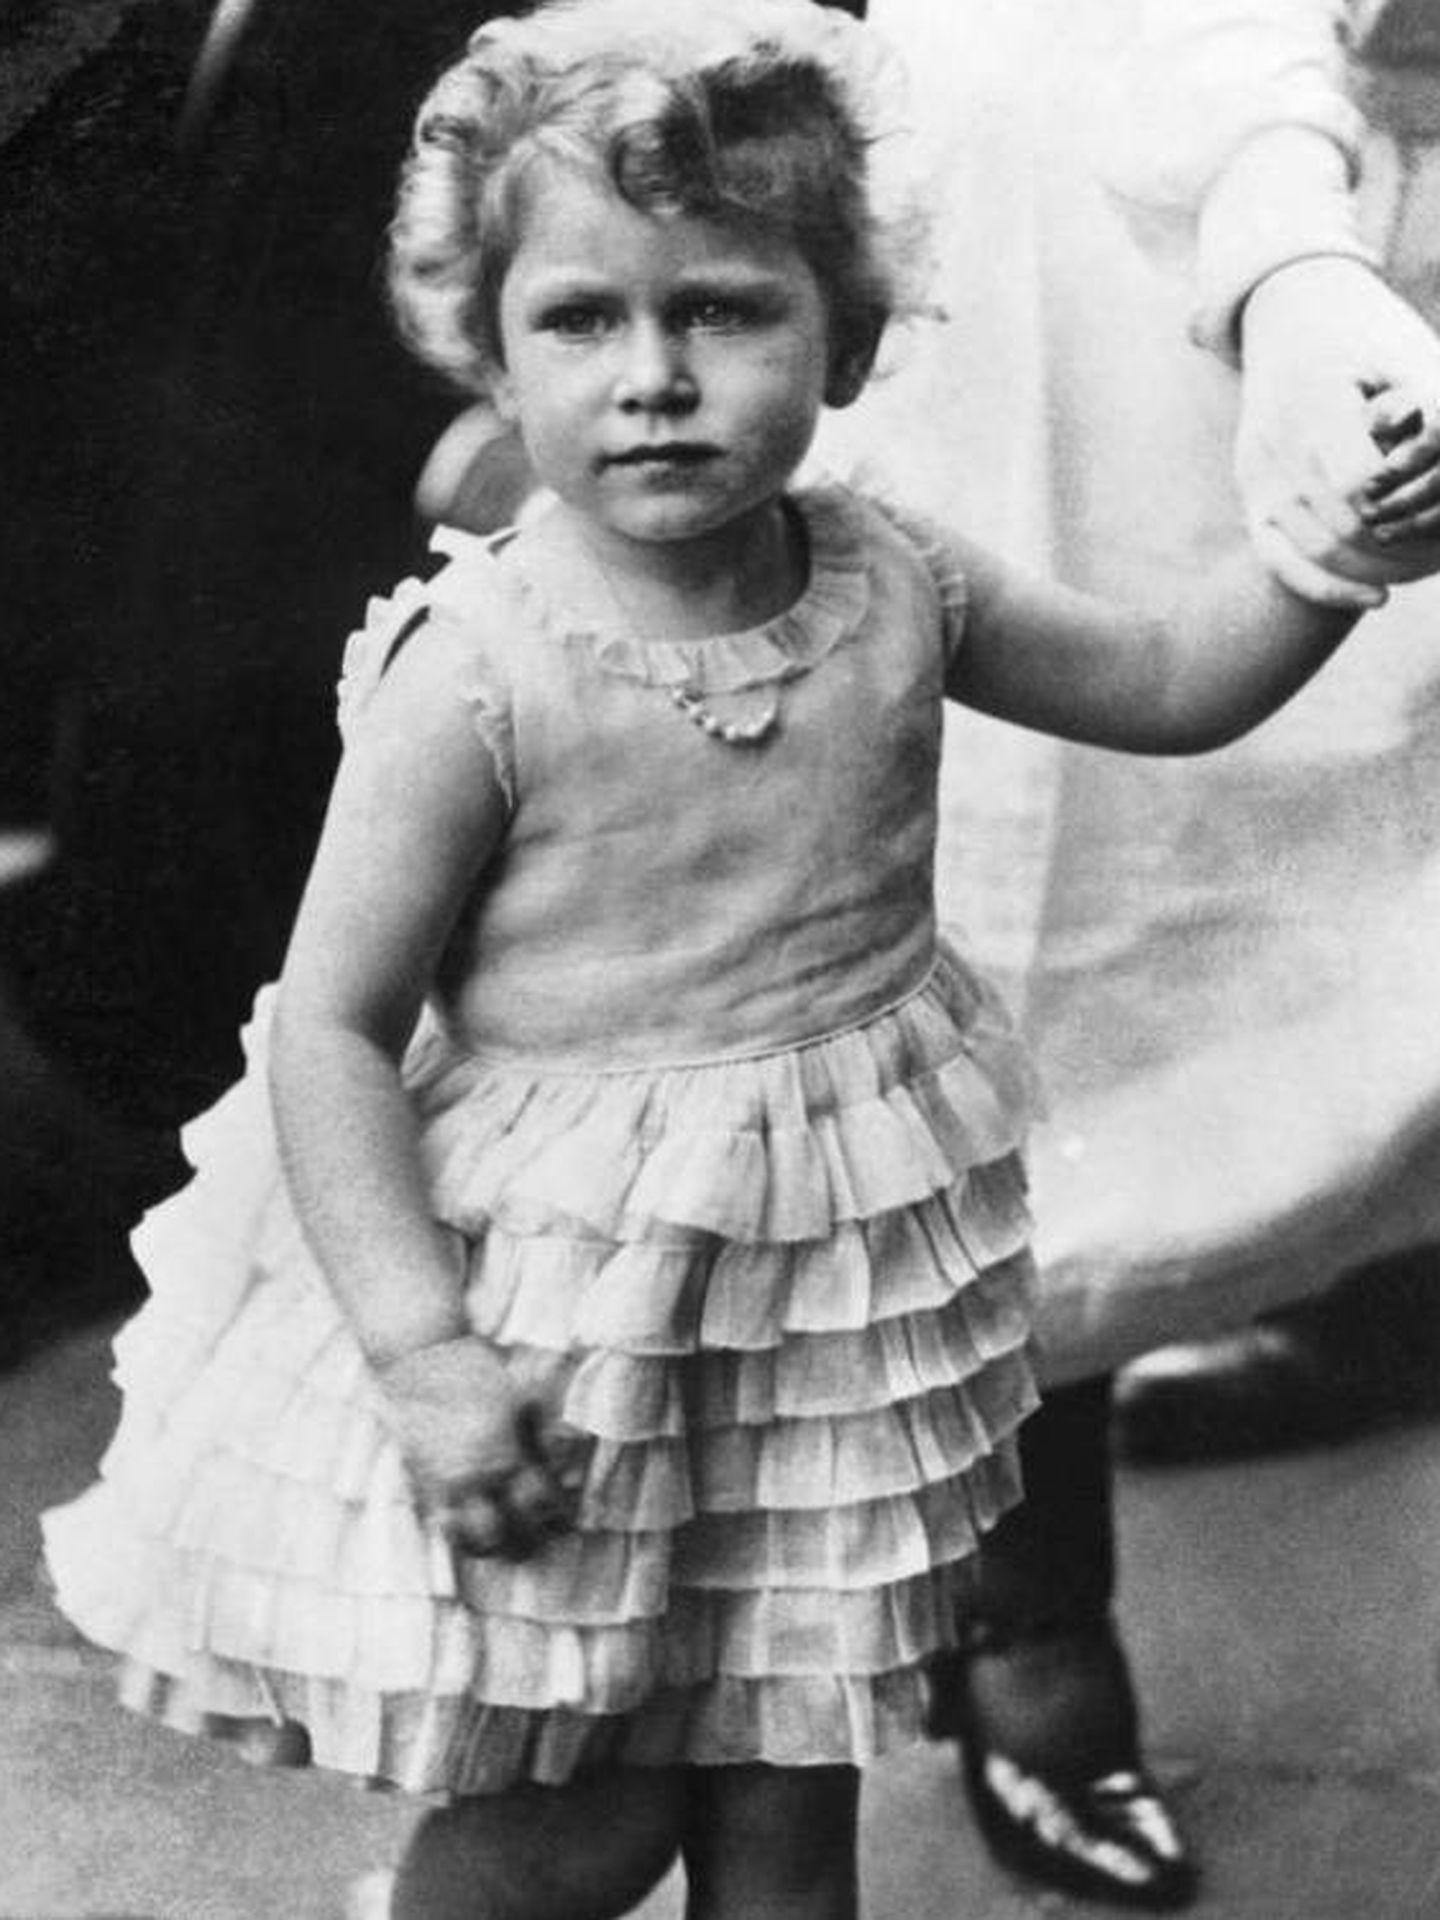 La reina Isabel II, de niña. (Getty)